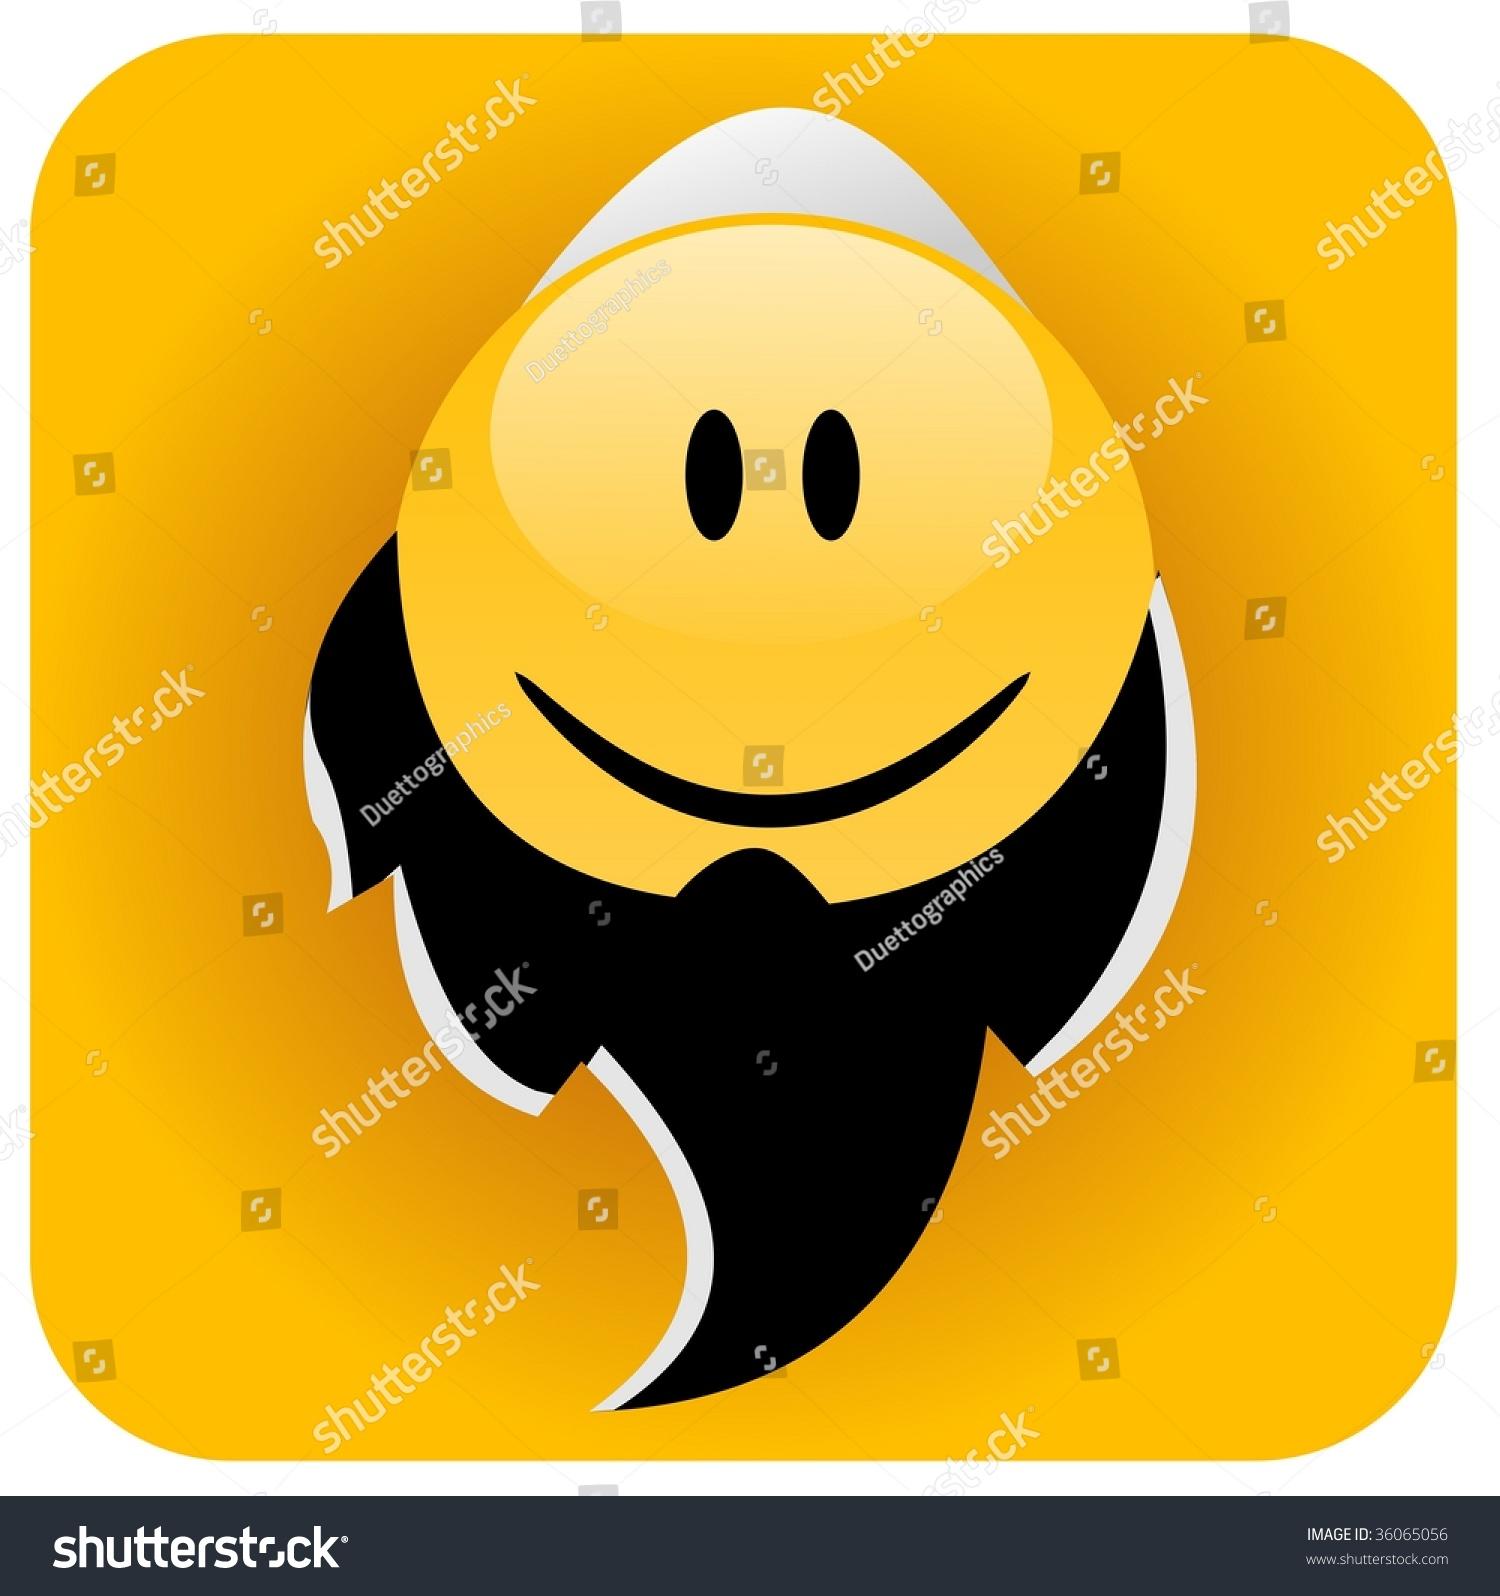 Muslim Smiley Man Stock Photo 36065056 : Shutterstock